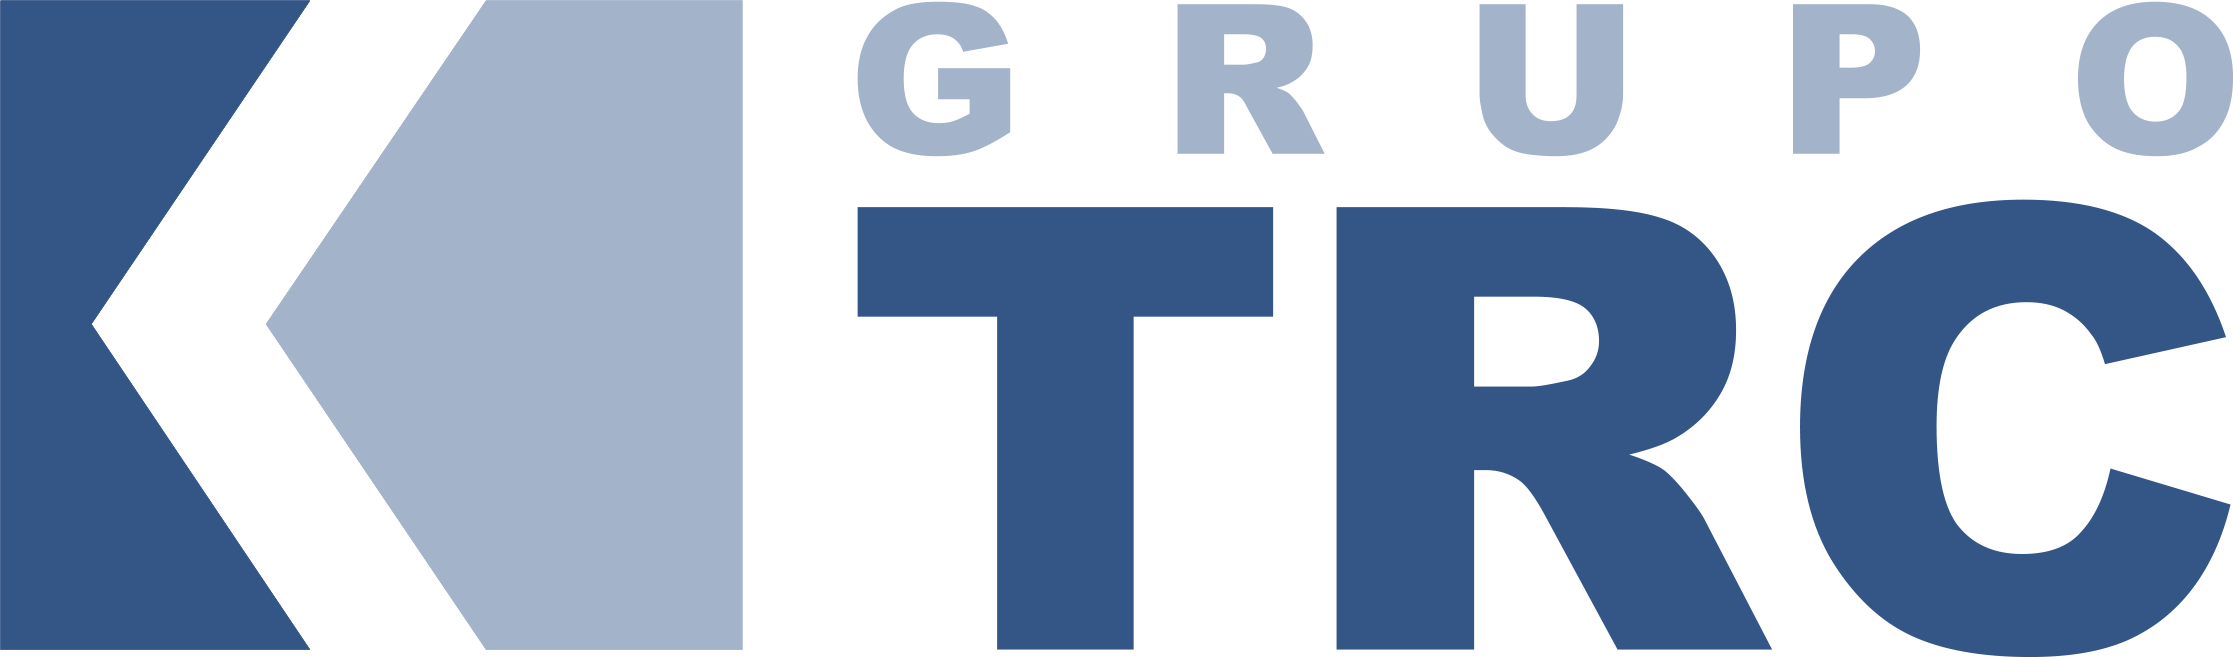 G-trc_logo